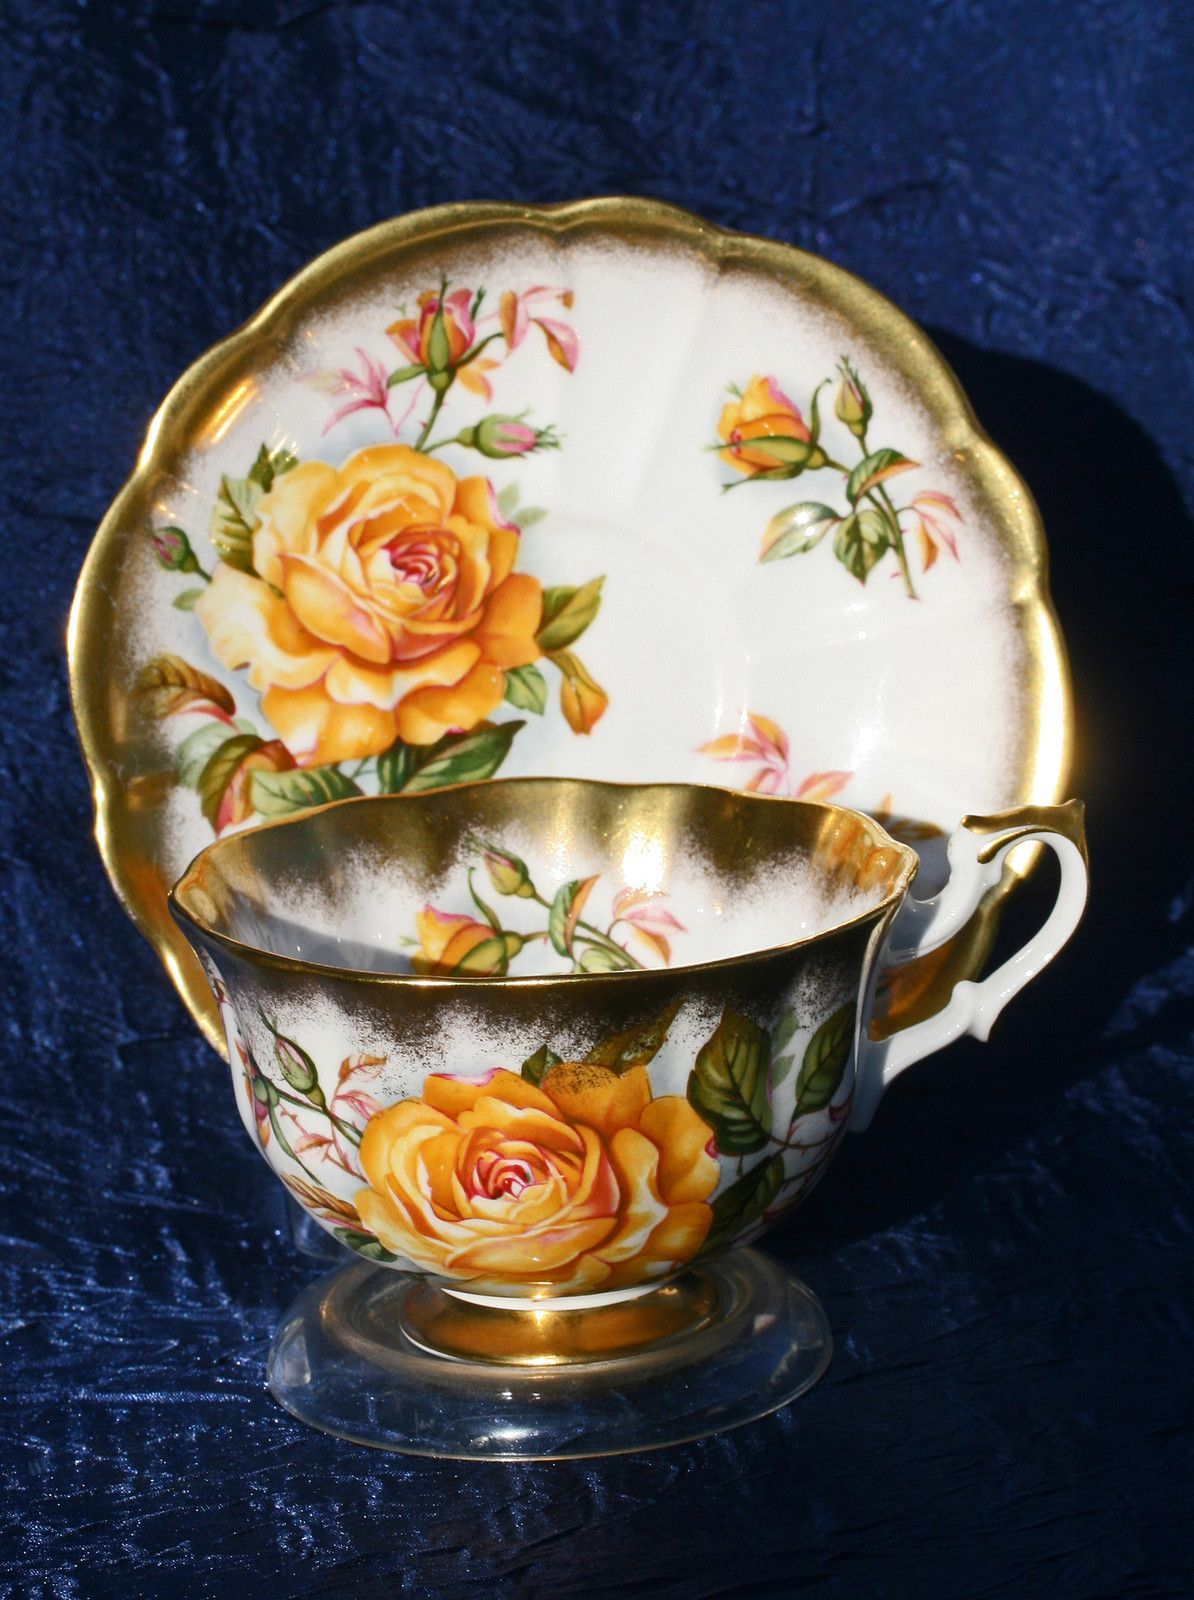 royal albert yellow rose gold crest series tea cup saucer porzellan kaffee und einrichtung. Black Bedroom Furniture Sets. Home Design Ideas